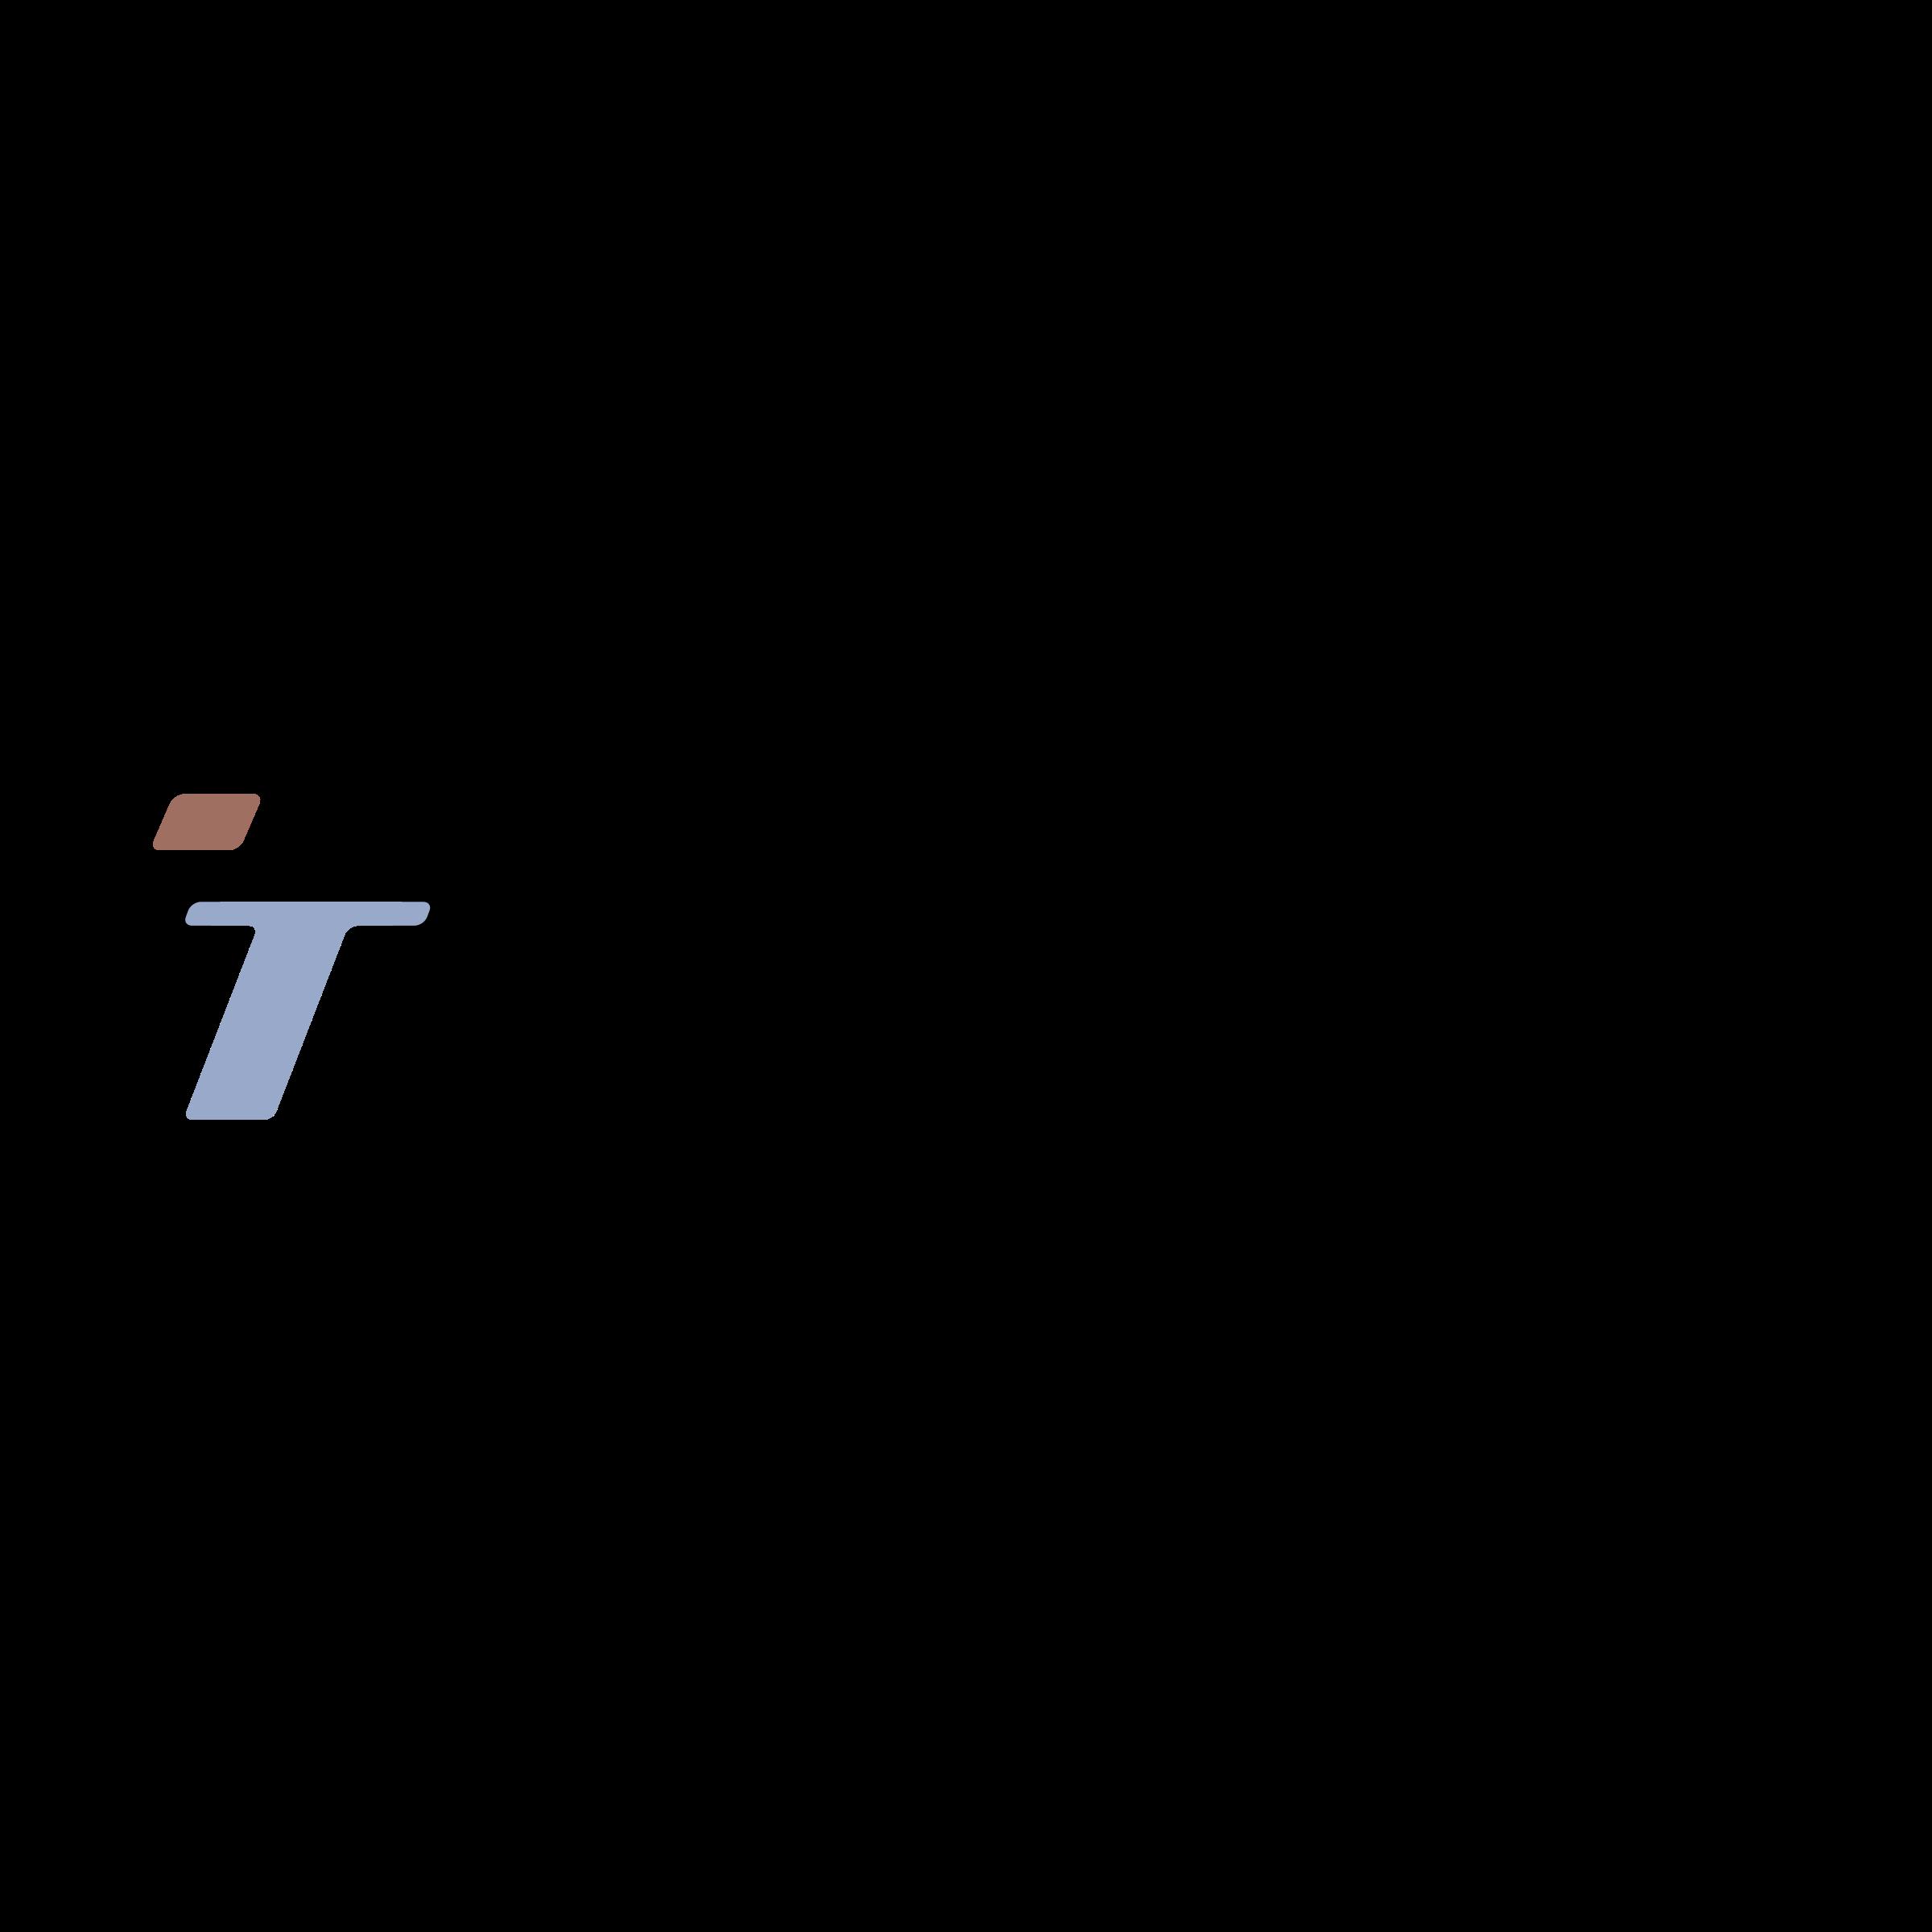 IT Frontier Logo PNG Transparent & SVG Vector.